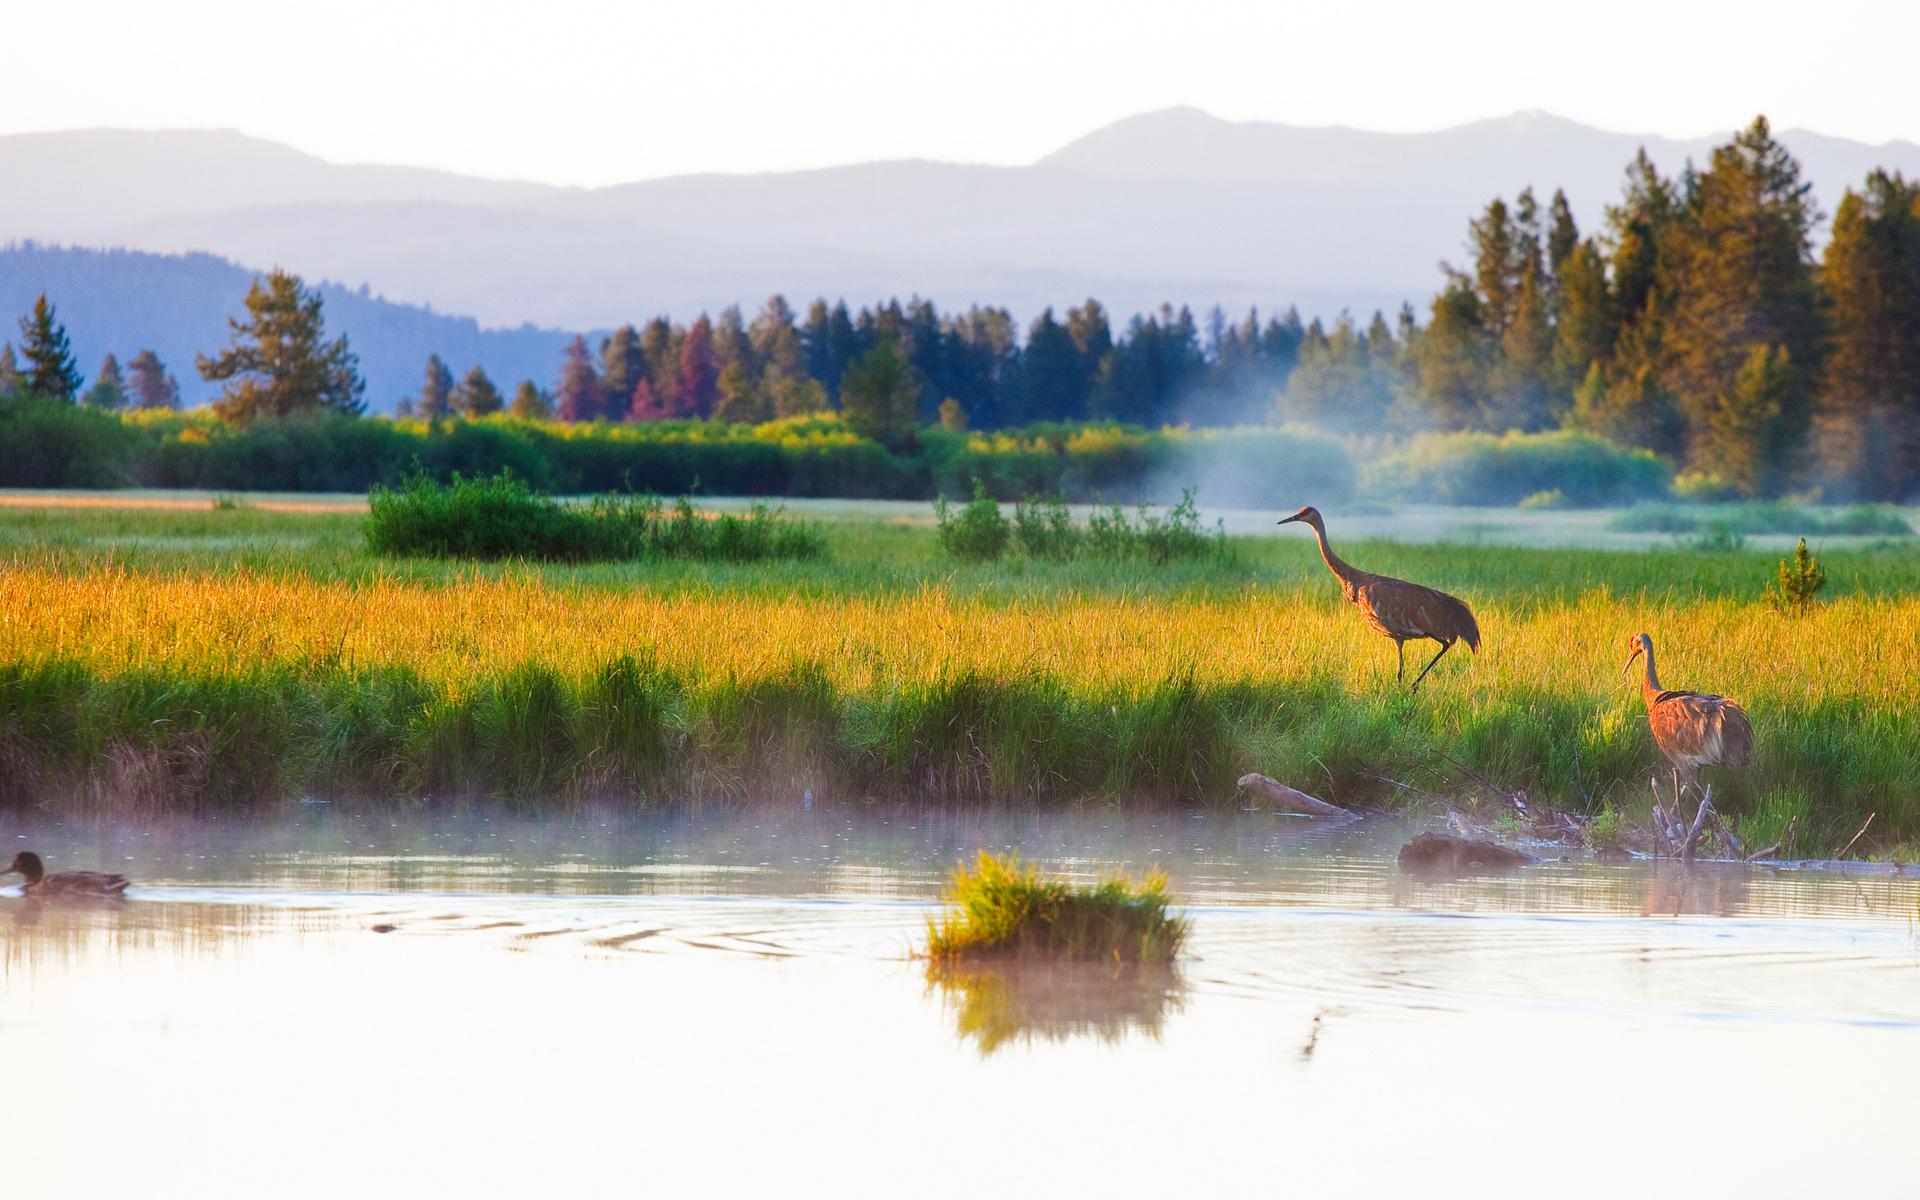 горы, лес, осень, озеро, цапля, птицы, утка, трава, туман